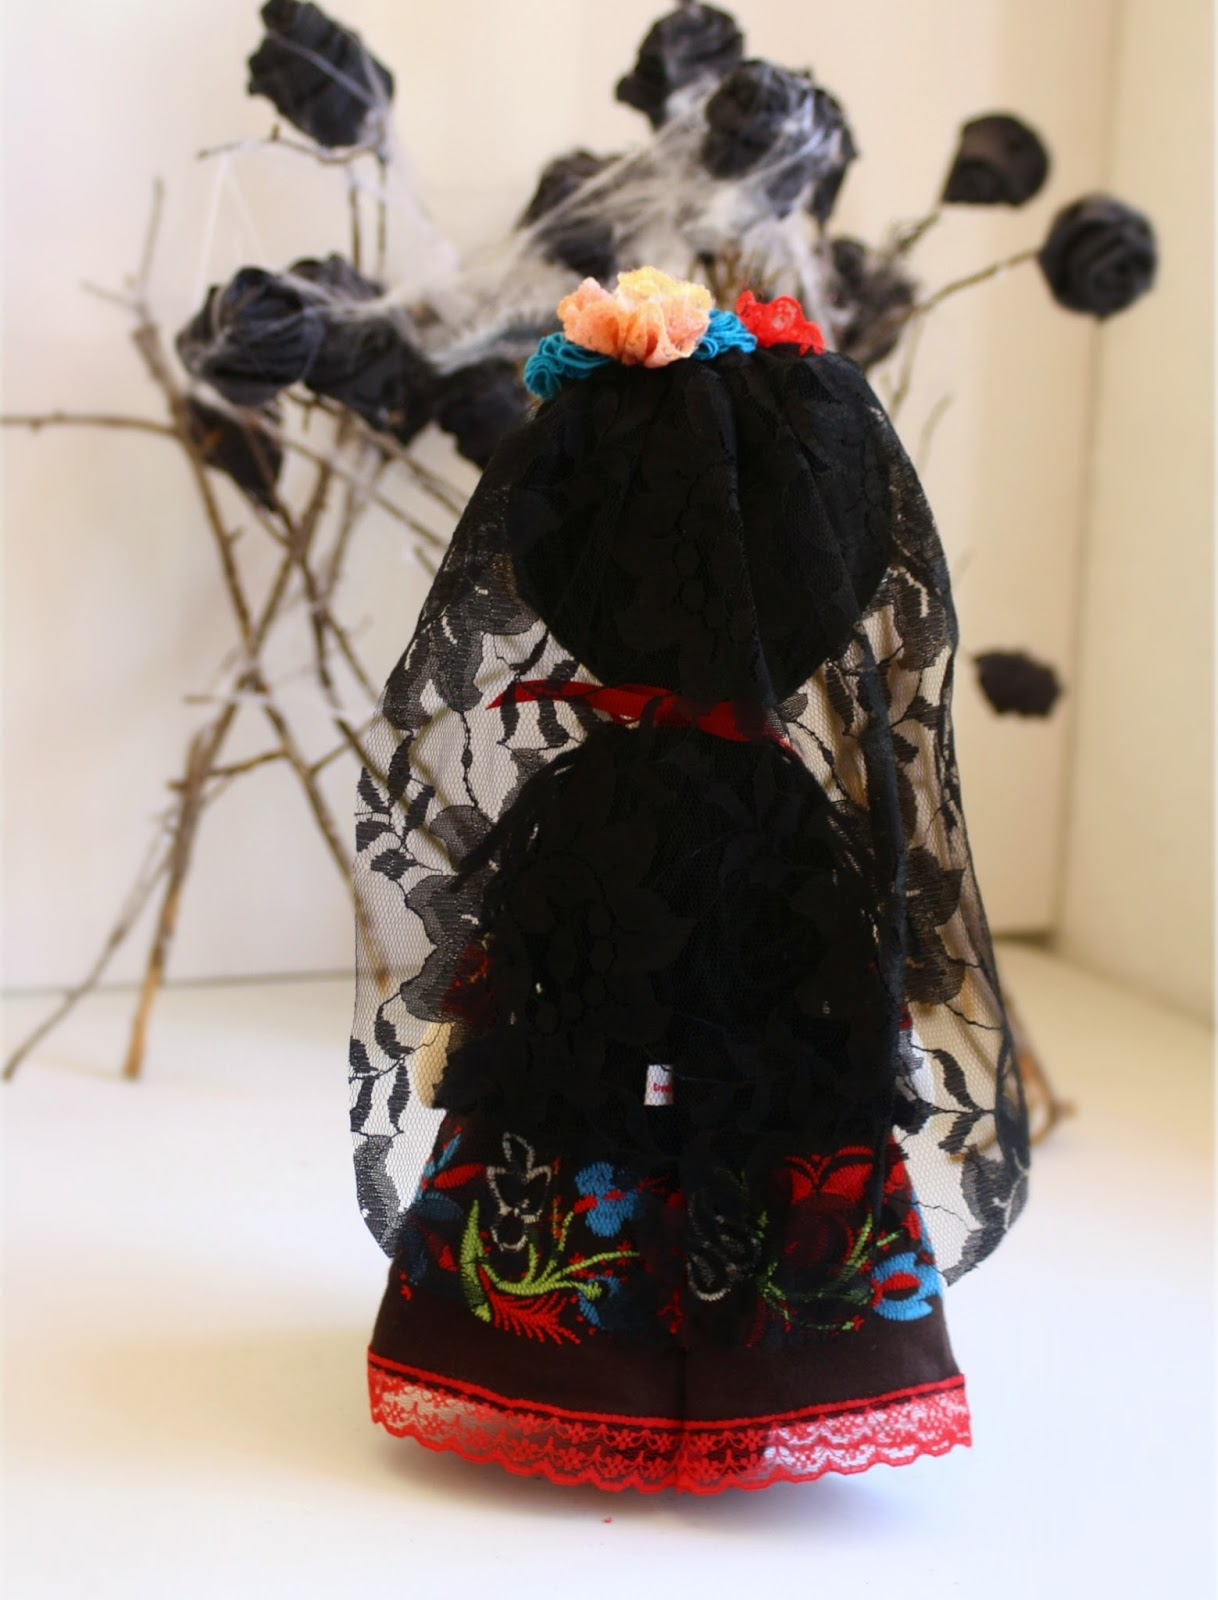 La Catrina, muñeca con velo negro de encaje de espaldas